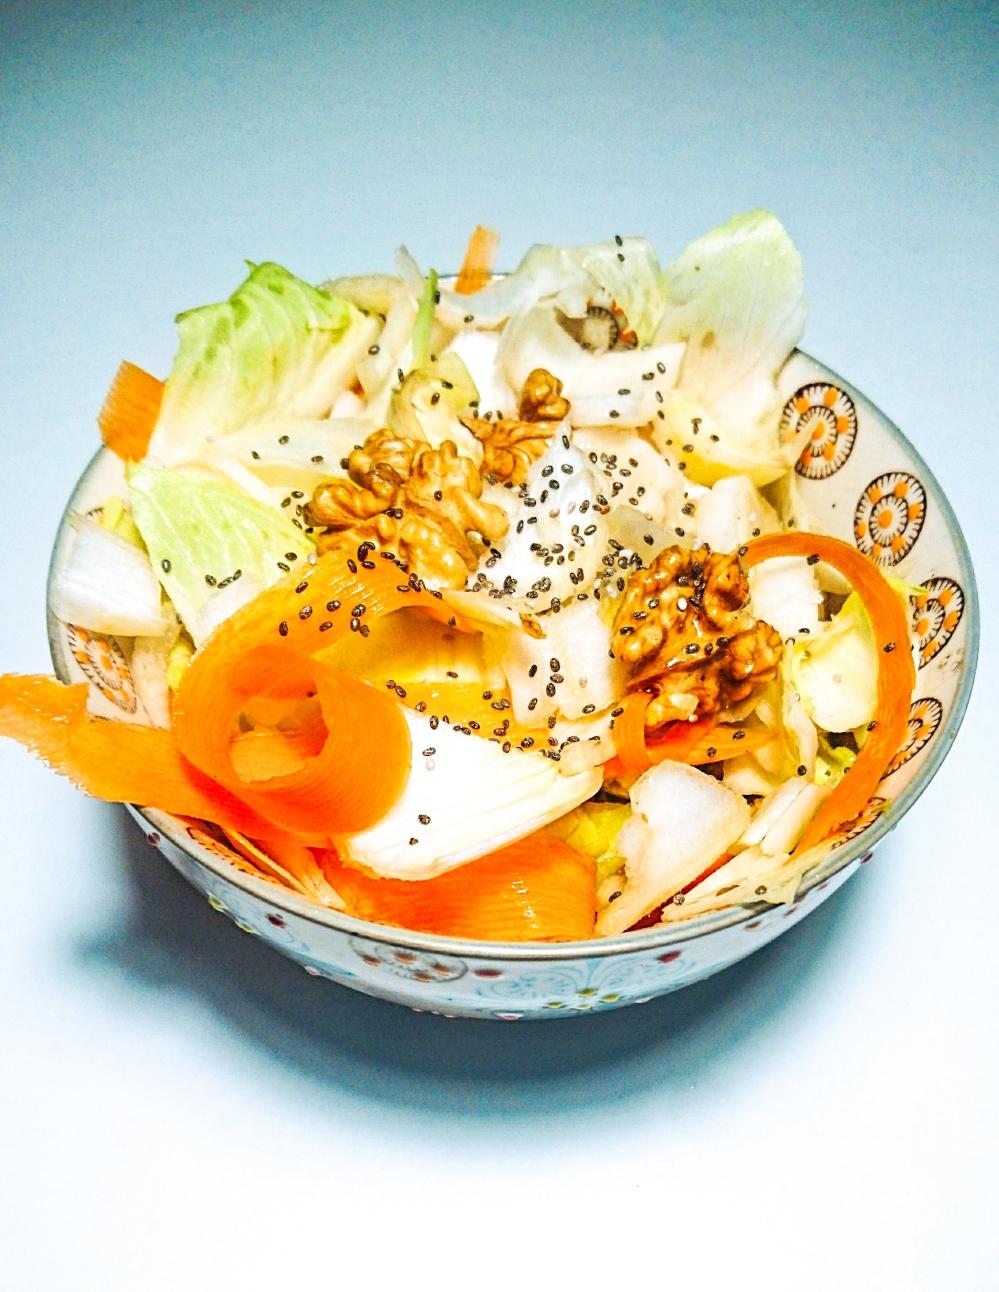 salade d'endives.jpg